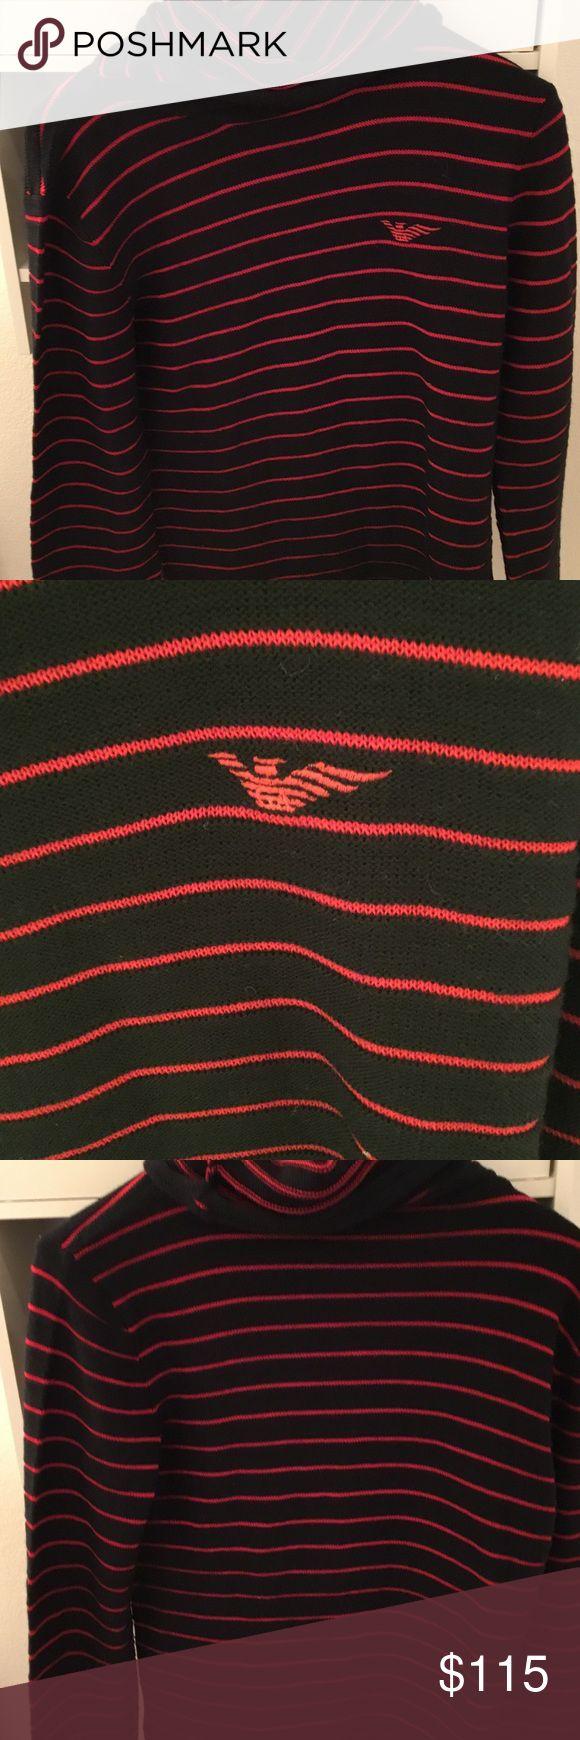 Men's Sweater Emporio Armani Men's Turtle Neck Sweater (Black with Red Stripes). US Medium. (50% Virgin Wool, 50% Acrylic). In excellent condition. Emporio Armani Sweaters Turtleneck